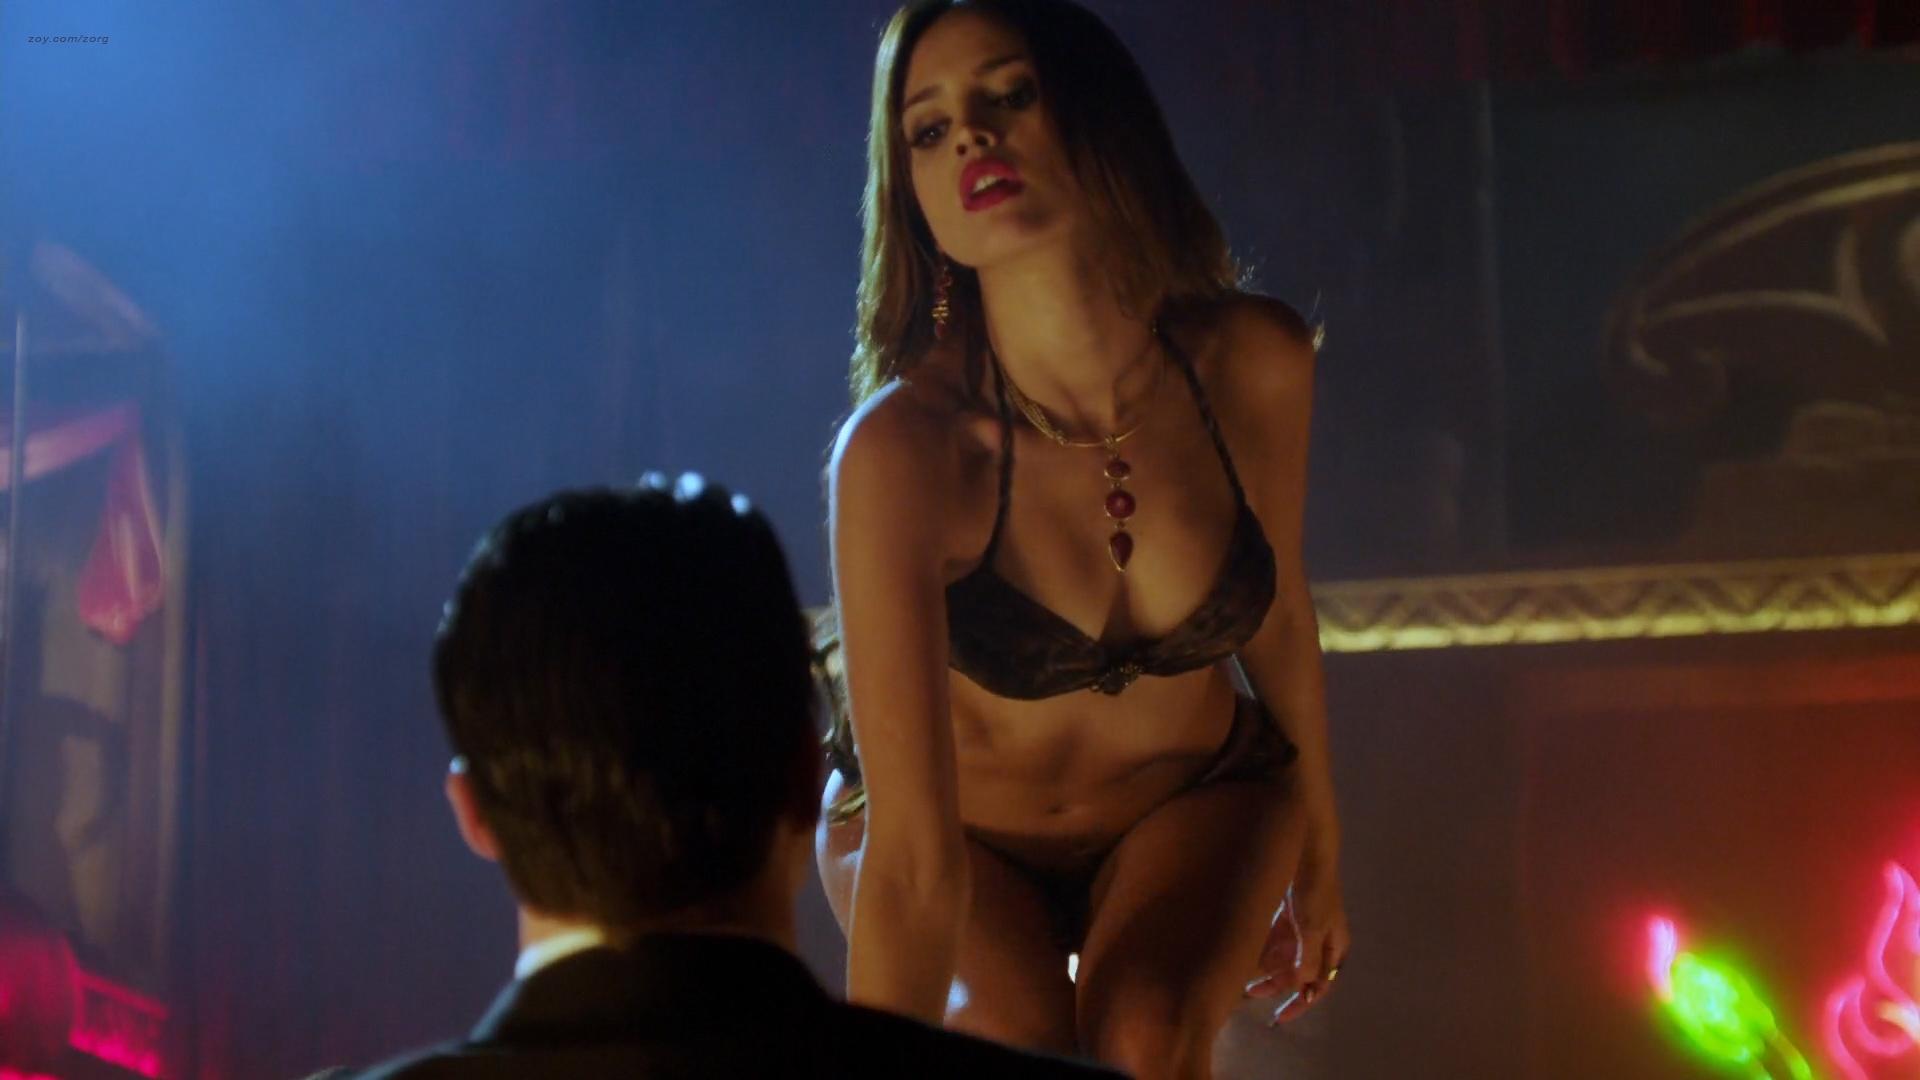 erotica sensual stories for women